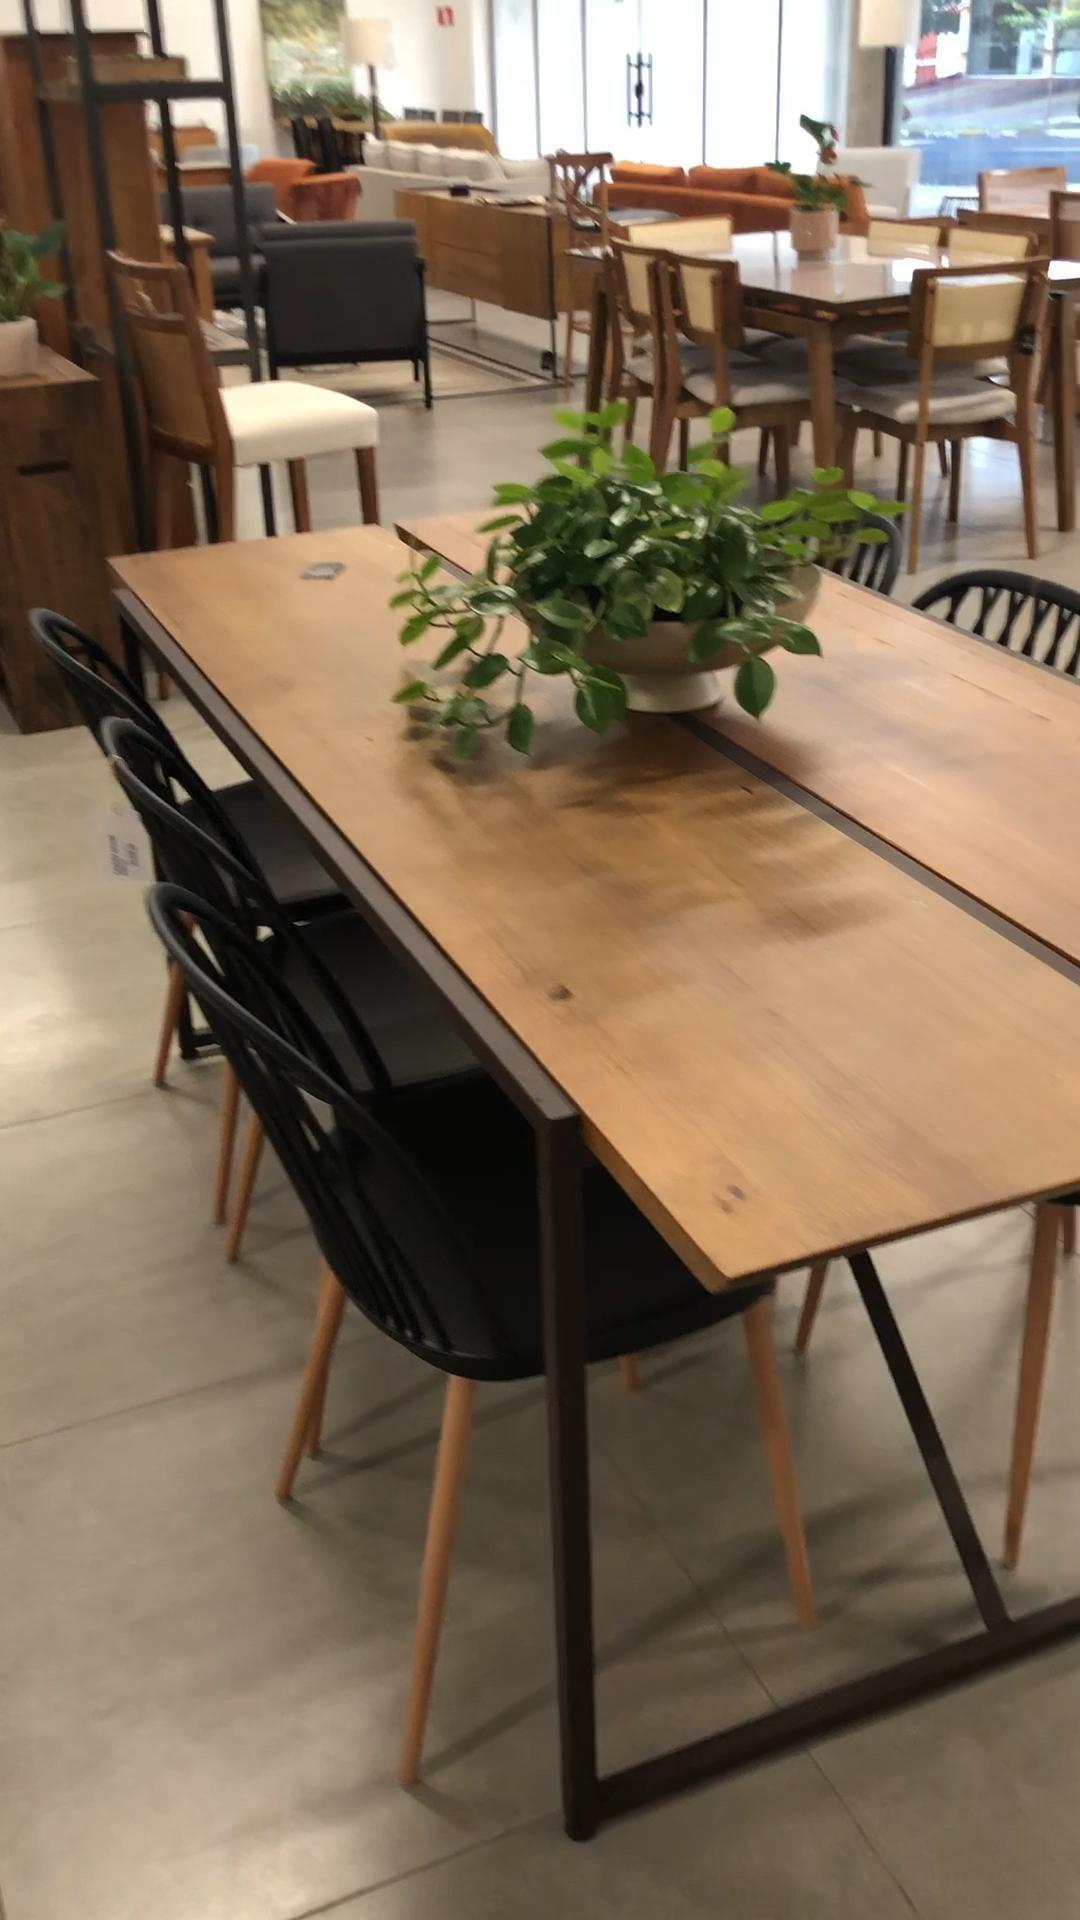 Mesa de Jantar Lumber Artefama Design Exclusivo Estilo Industrial Ferro e Madeira - Toth Móveis